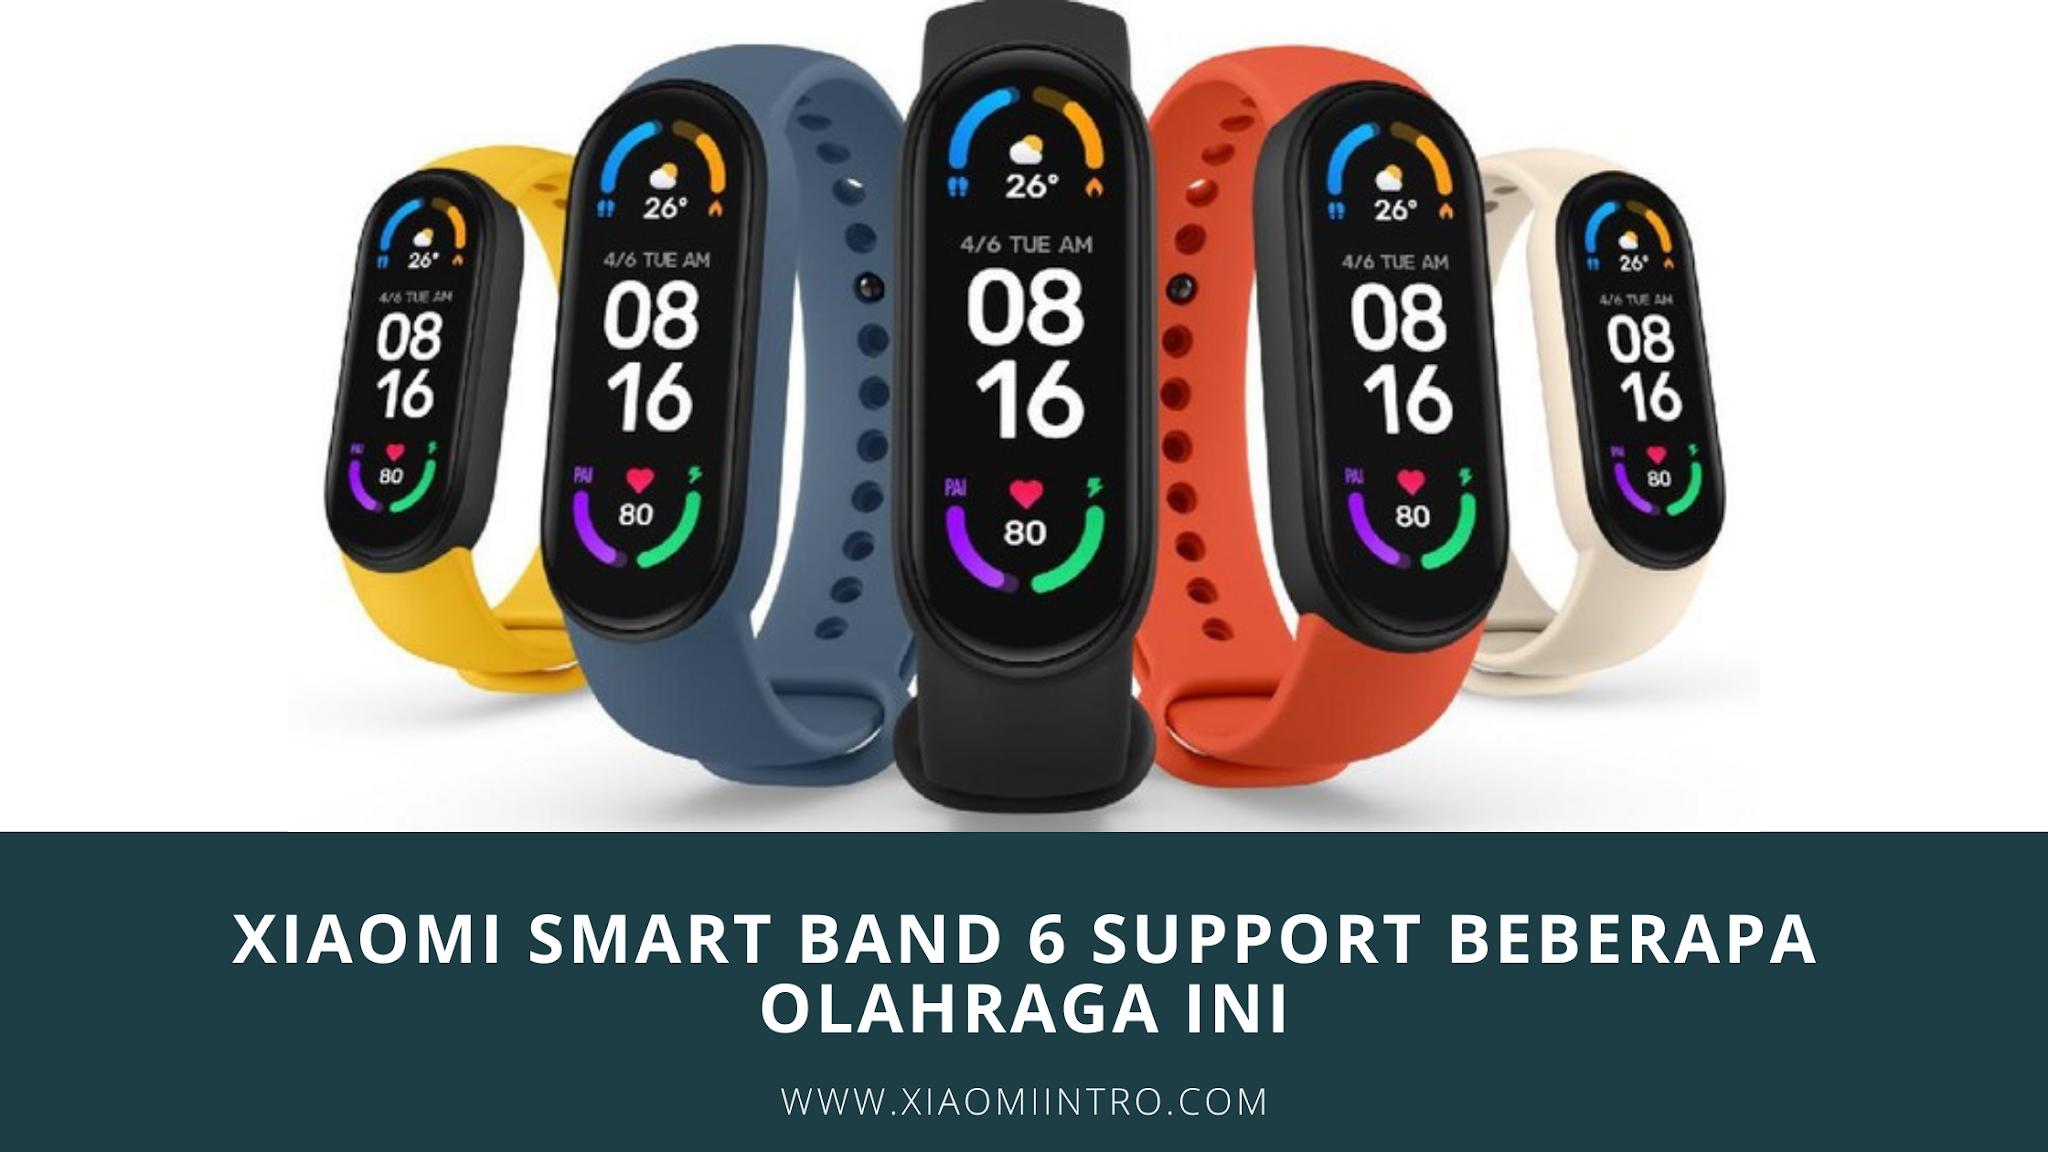 Xiaomi Smart Band 6 Support Olahraga Ini